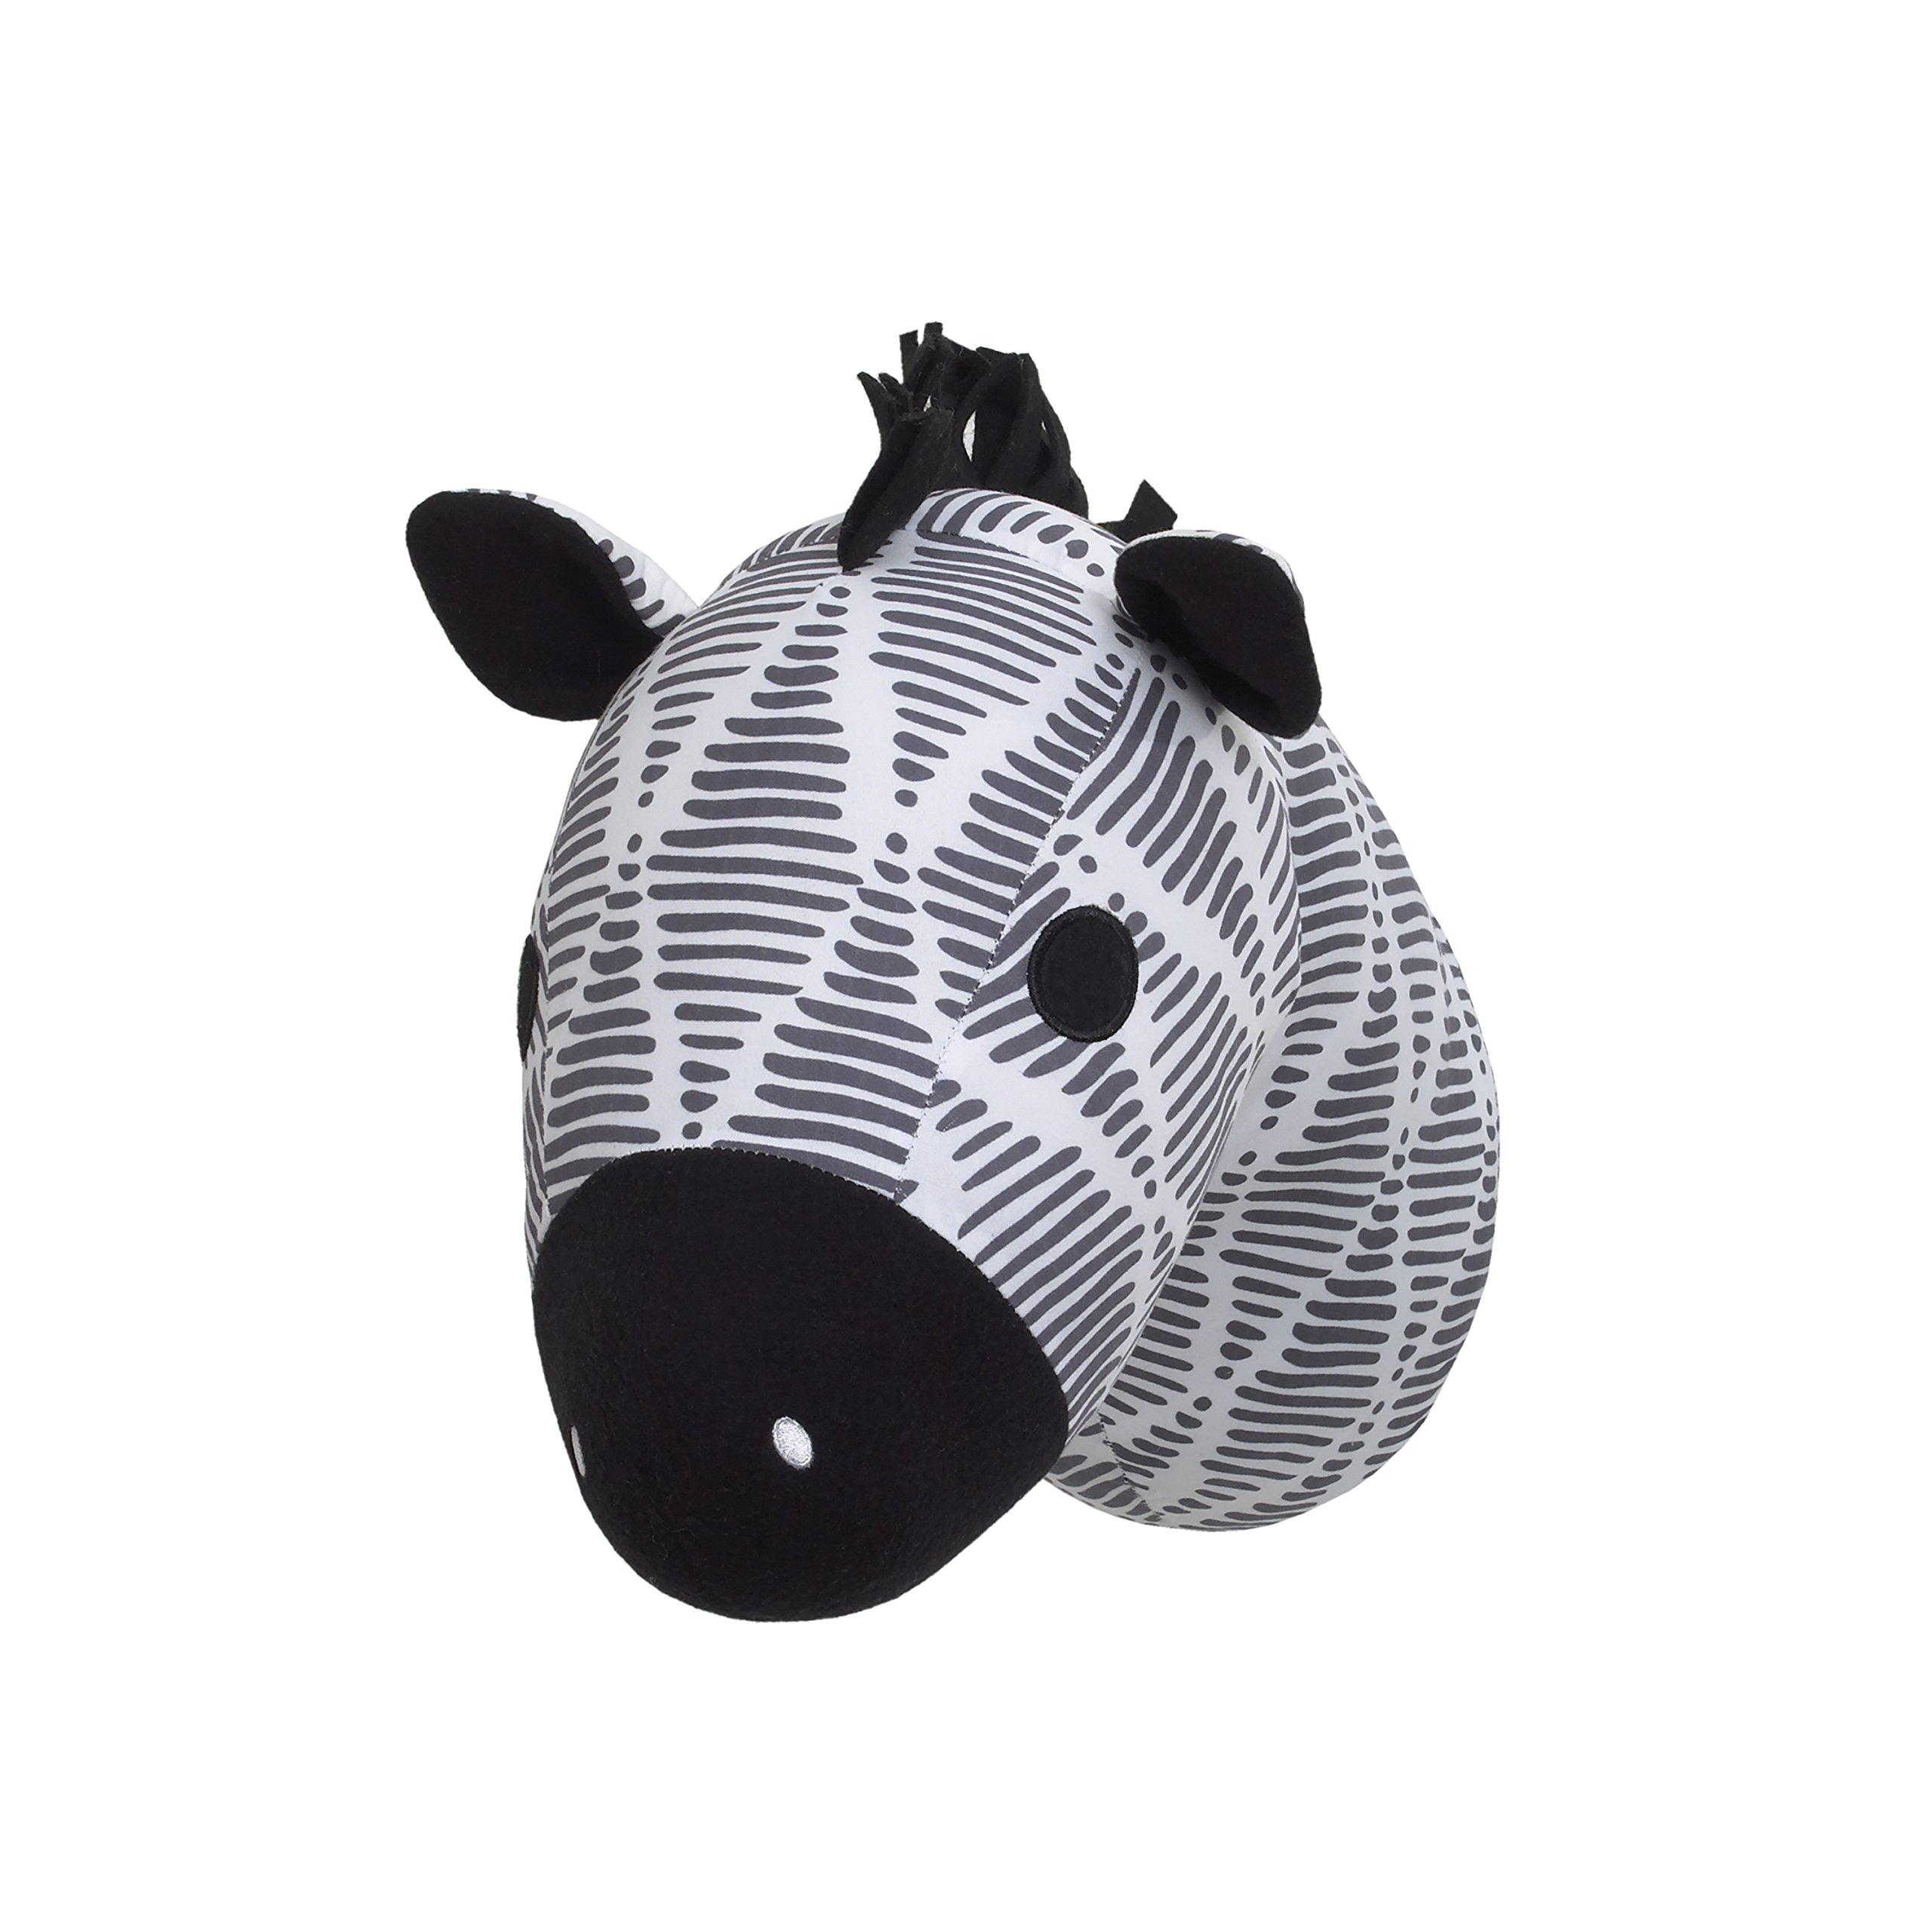 NoJo Head Printed Wall Decor, Black/White/Grey/Zebra